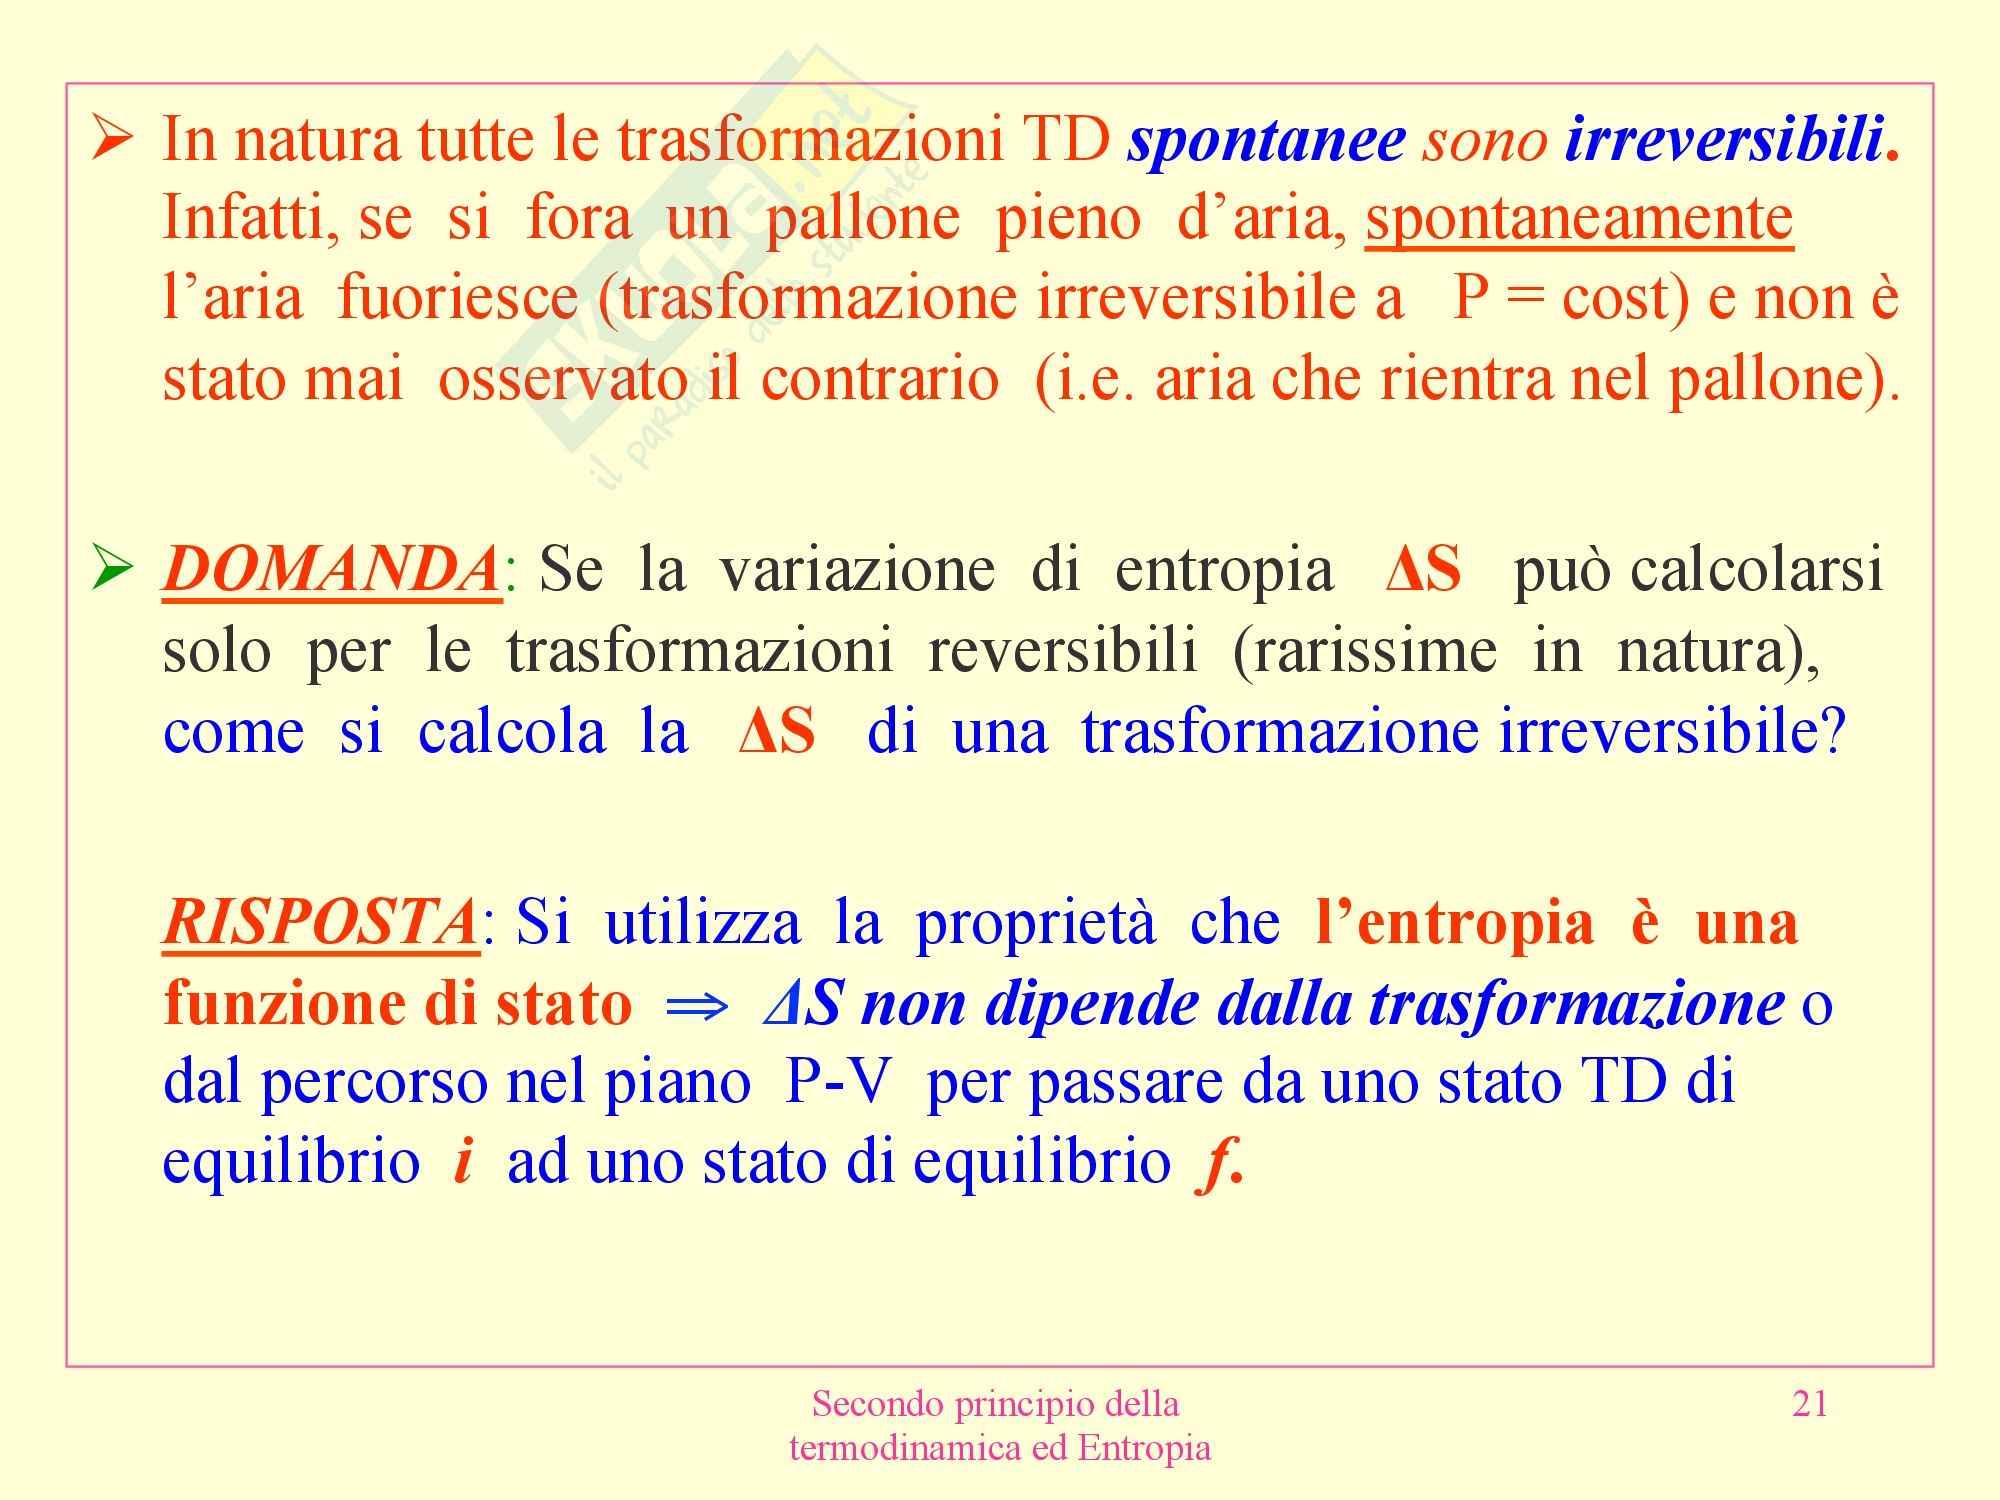 Fisica medica - secondo principio termodinamica Pag. 21